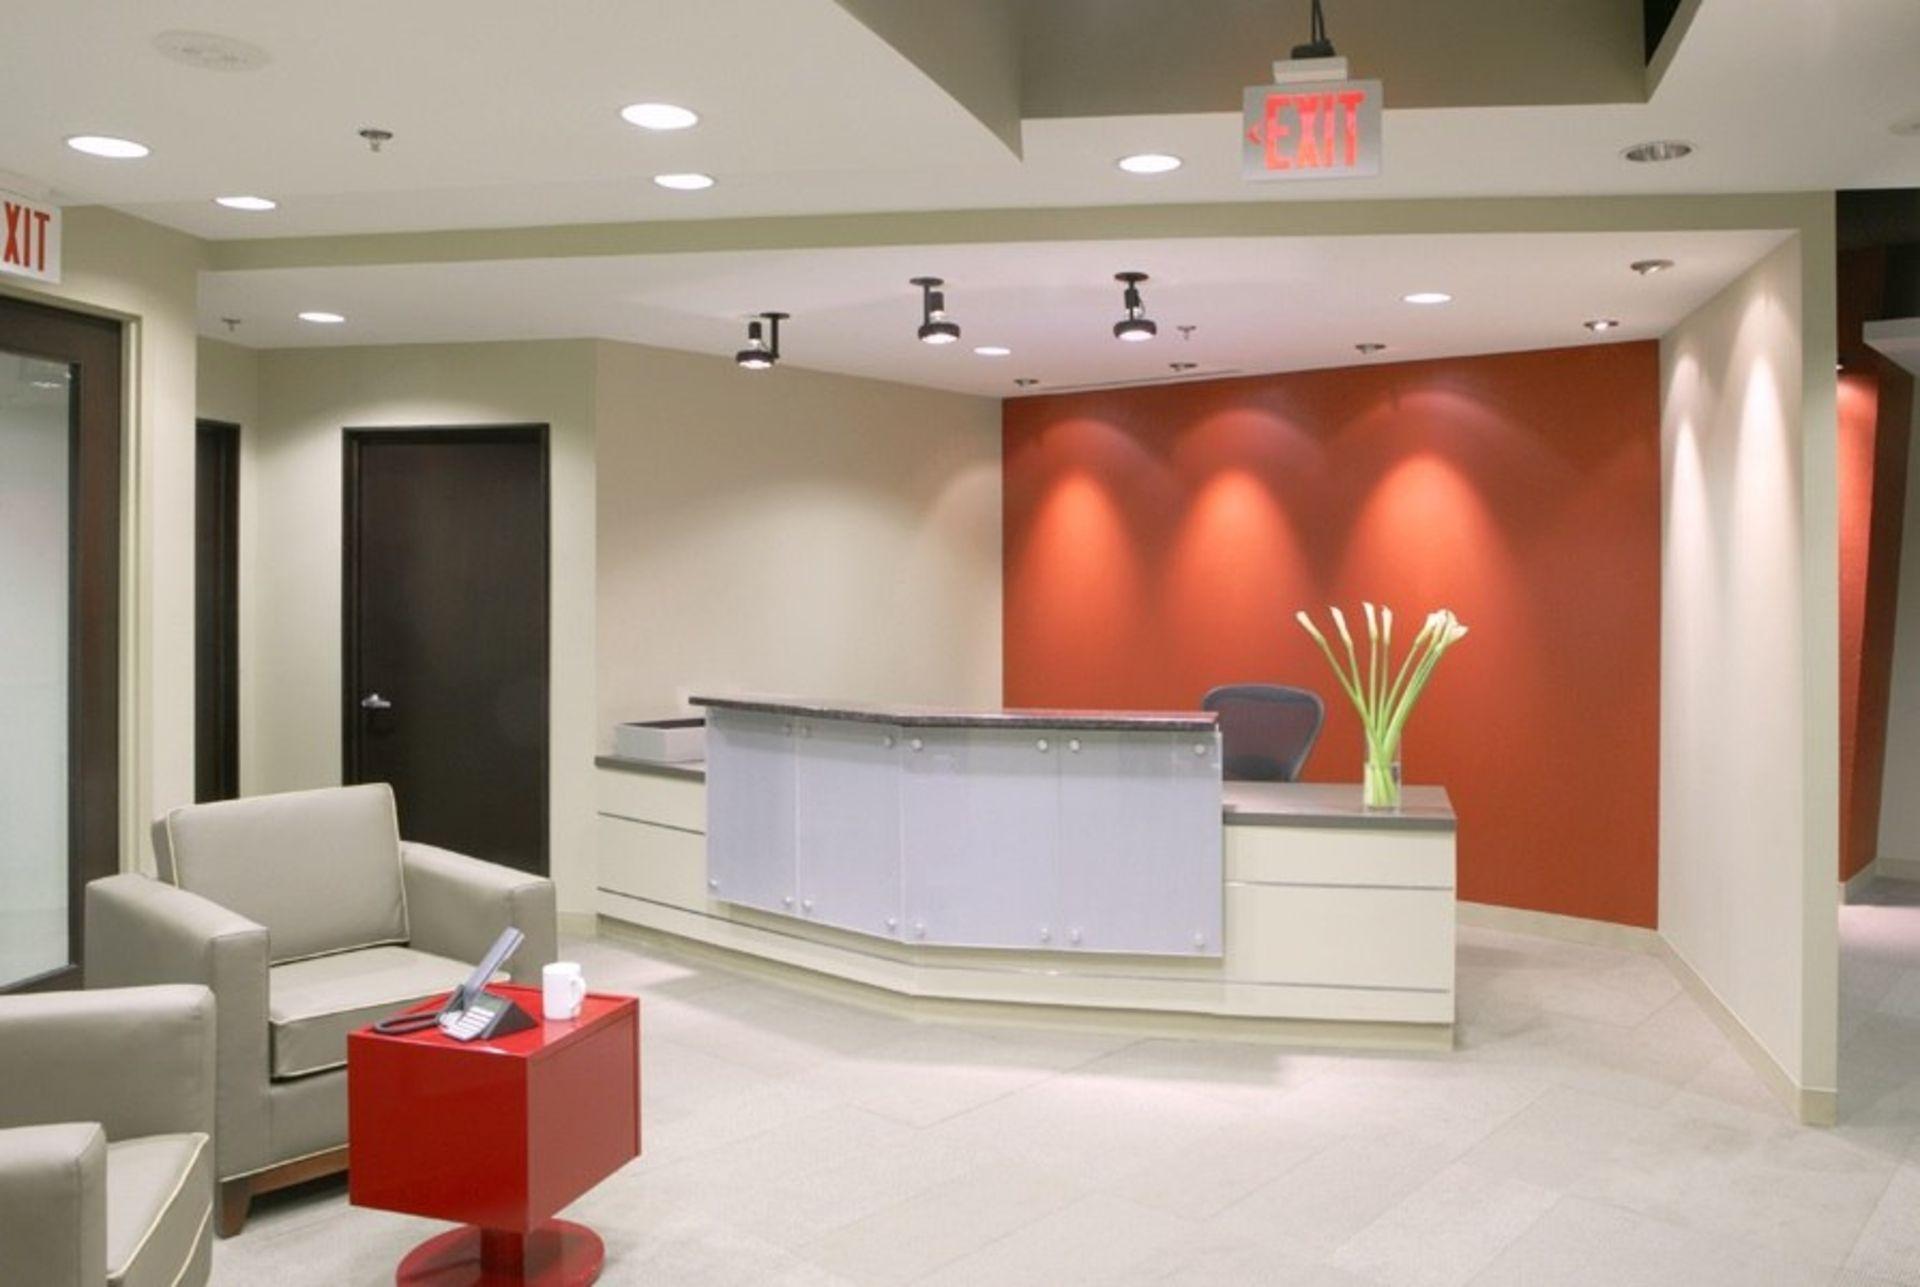 Interesting office interior design ideas photos interior for Office lobby interior design